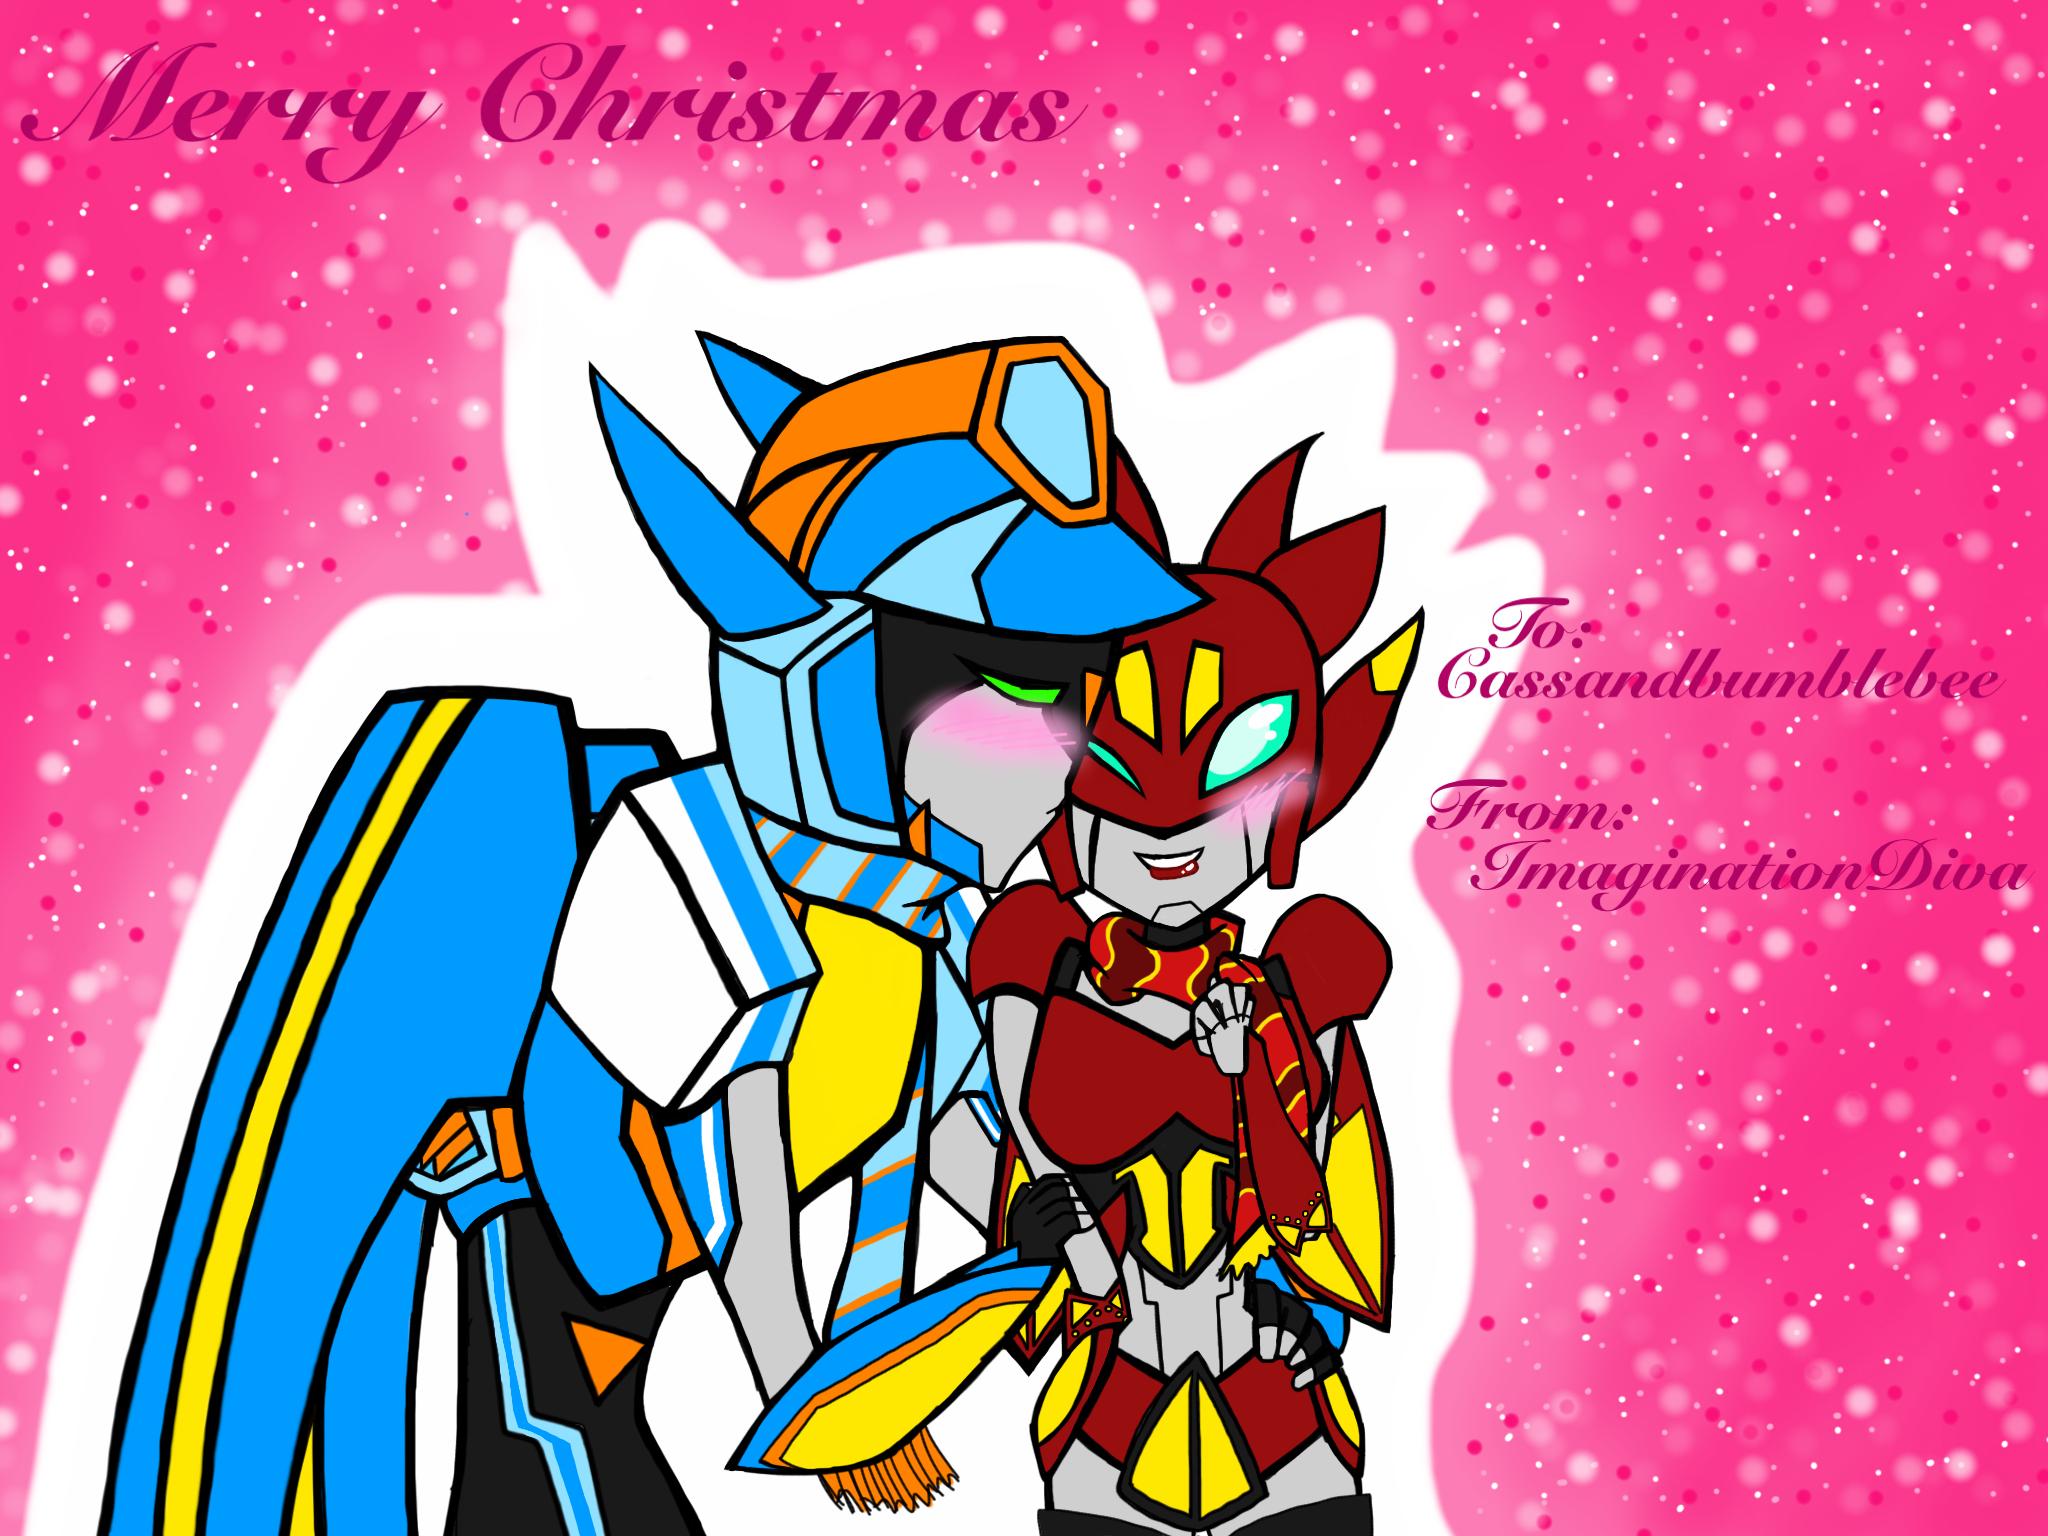 Christmas Present - Cassandbumblebee  by ImaginationDiva